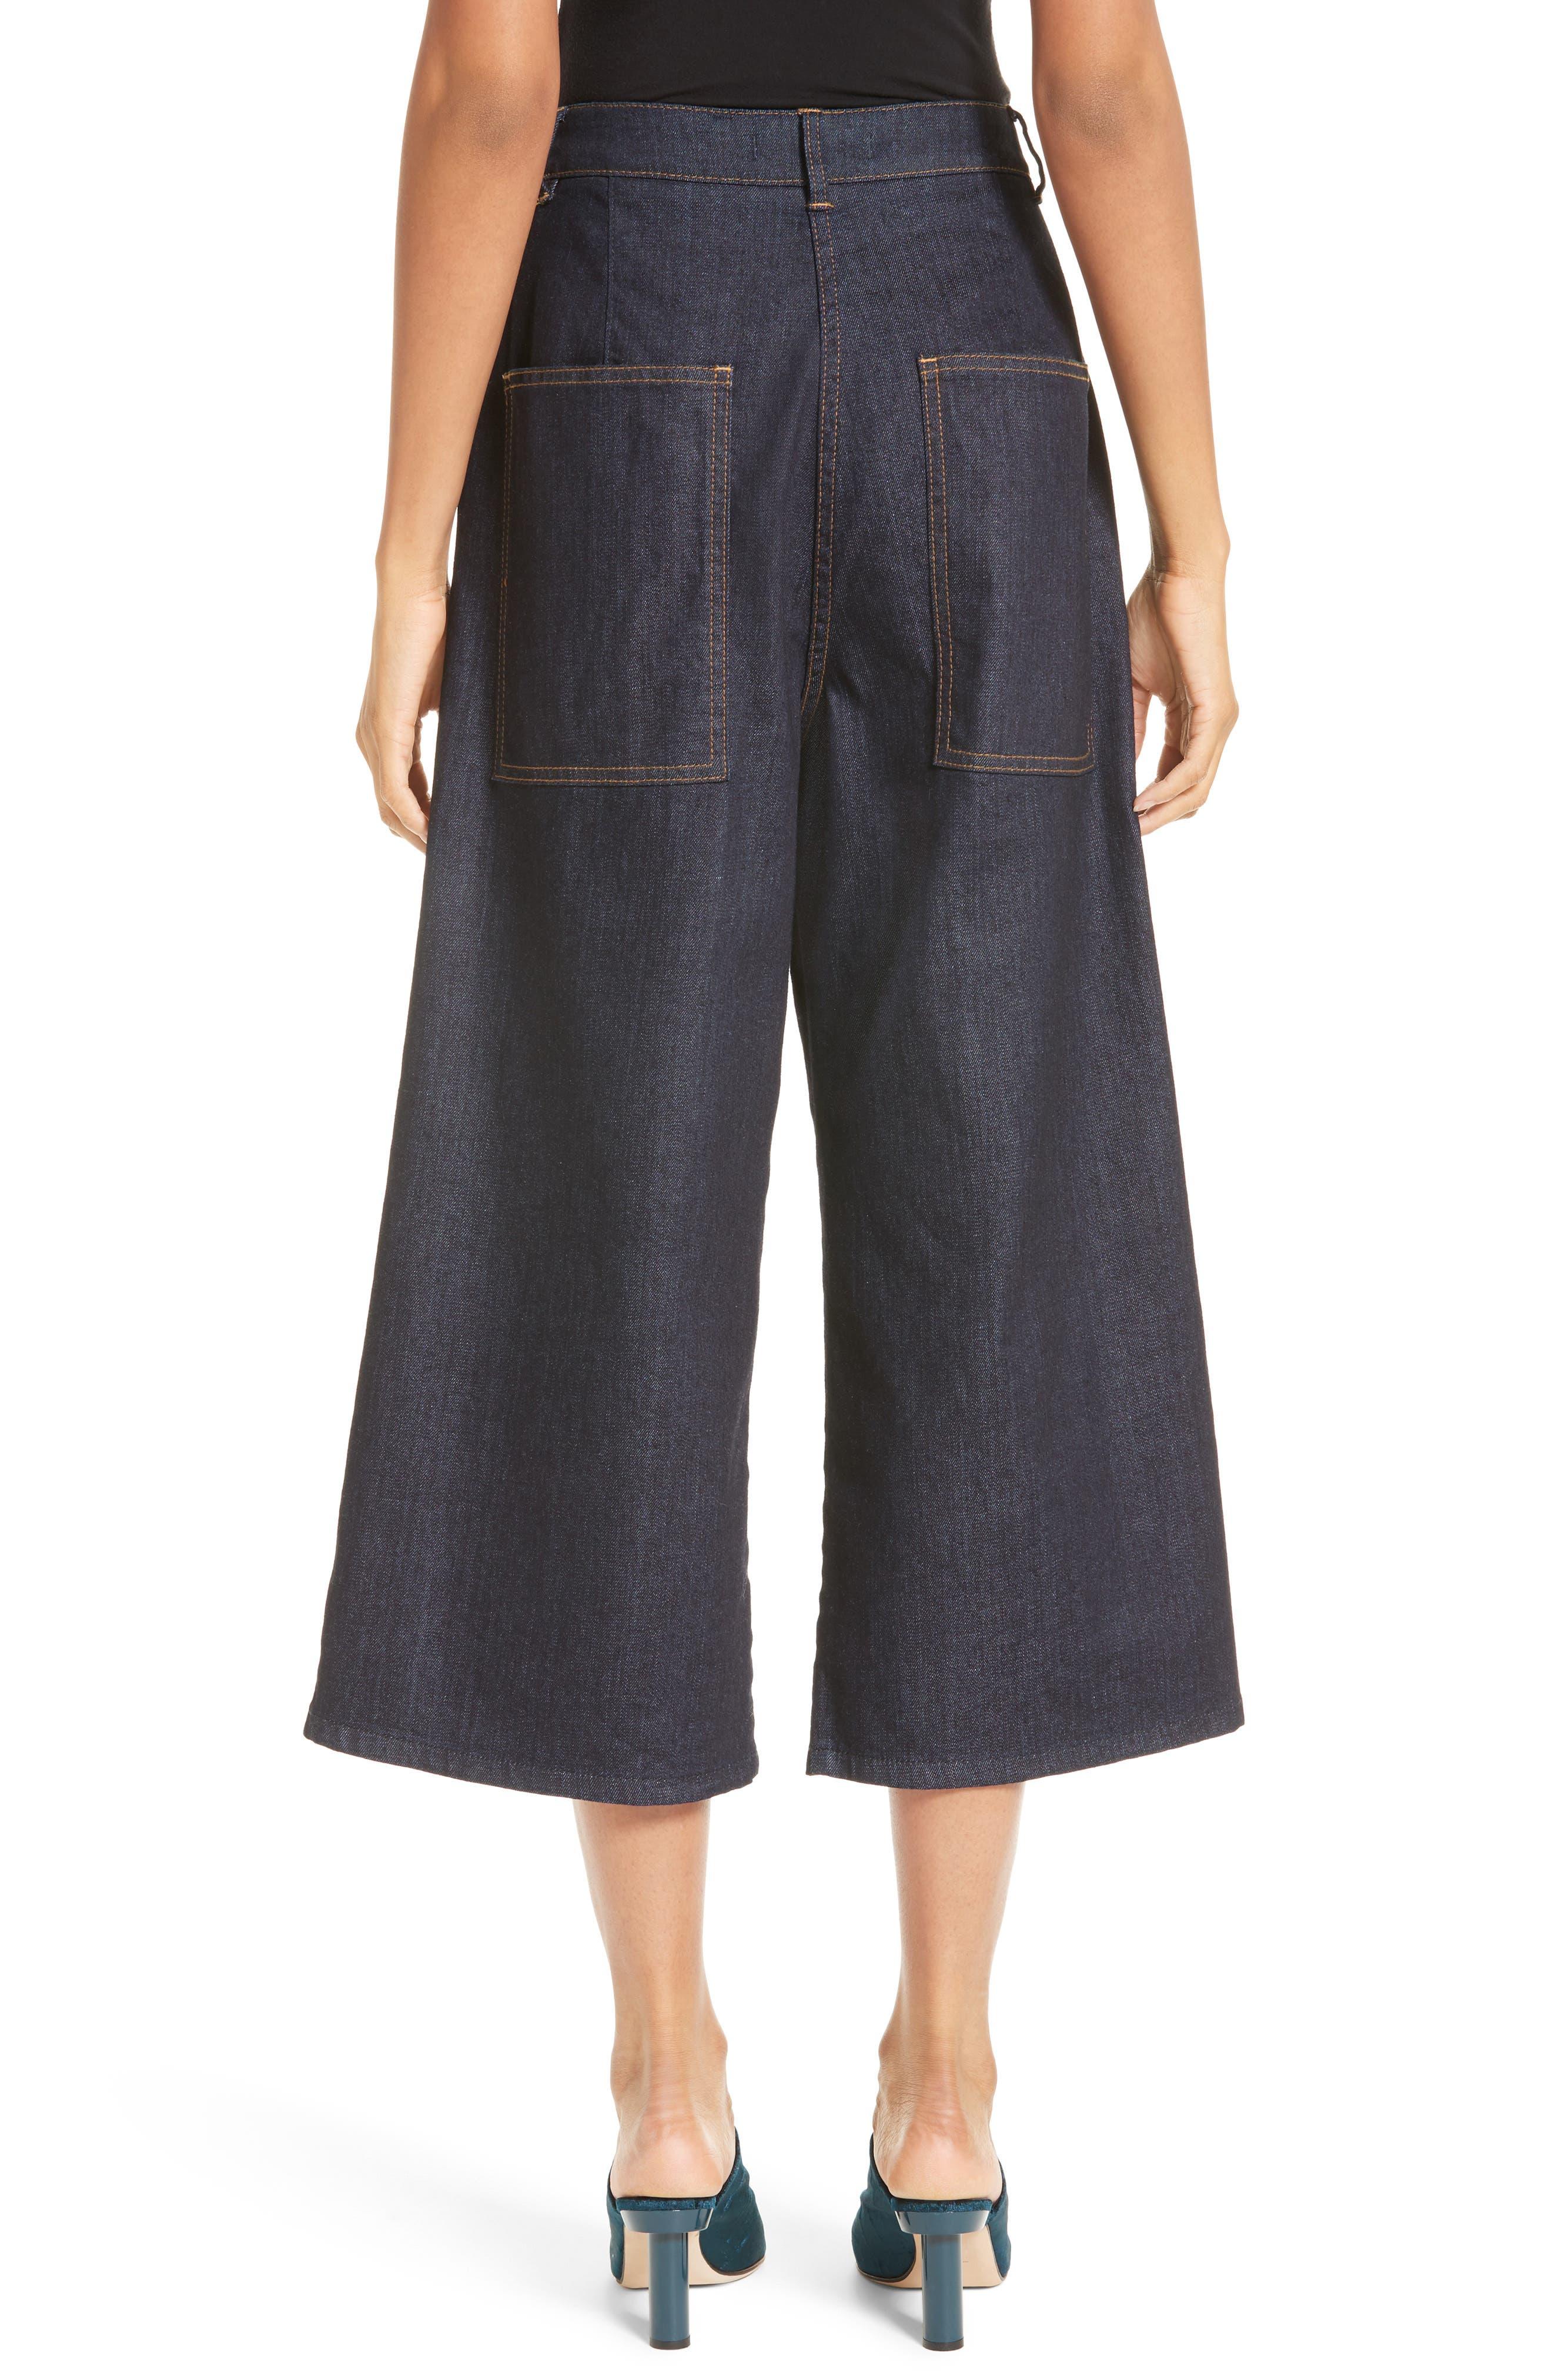 Sam High Waist Culotte Jeans,                             Alternate thumbnail 2, color,                             401